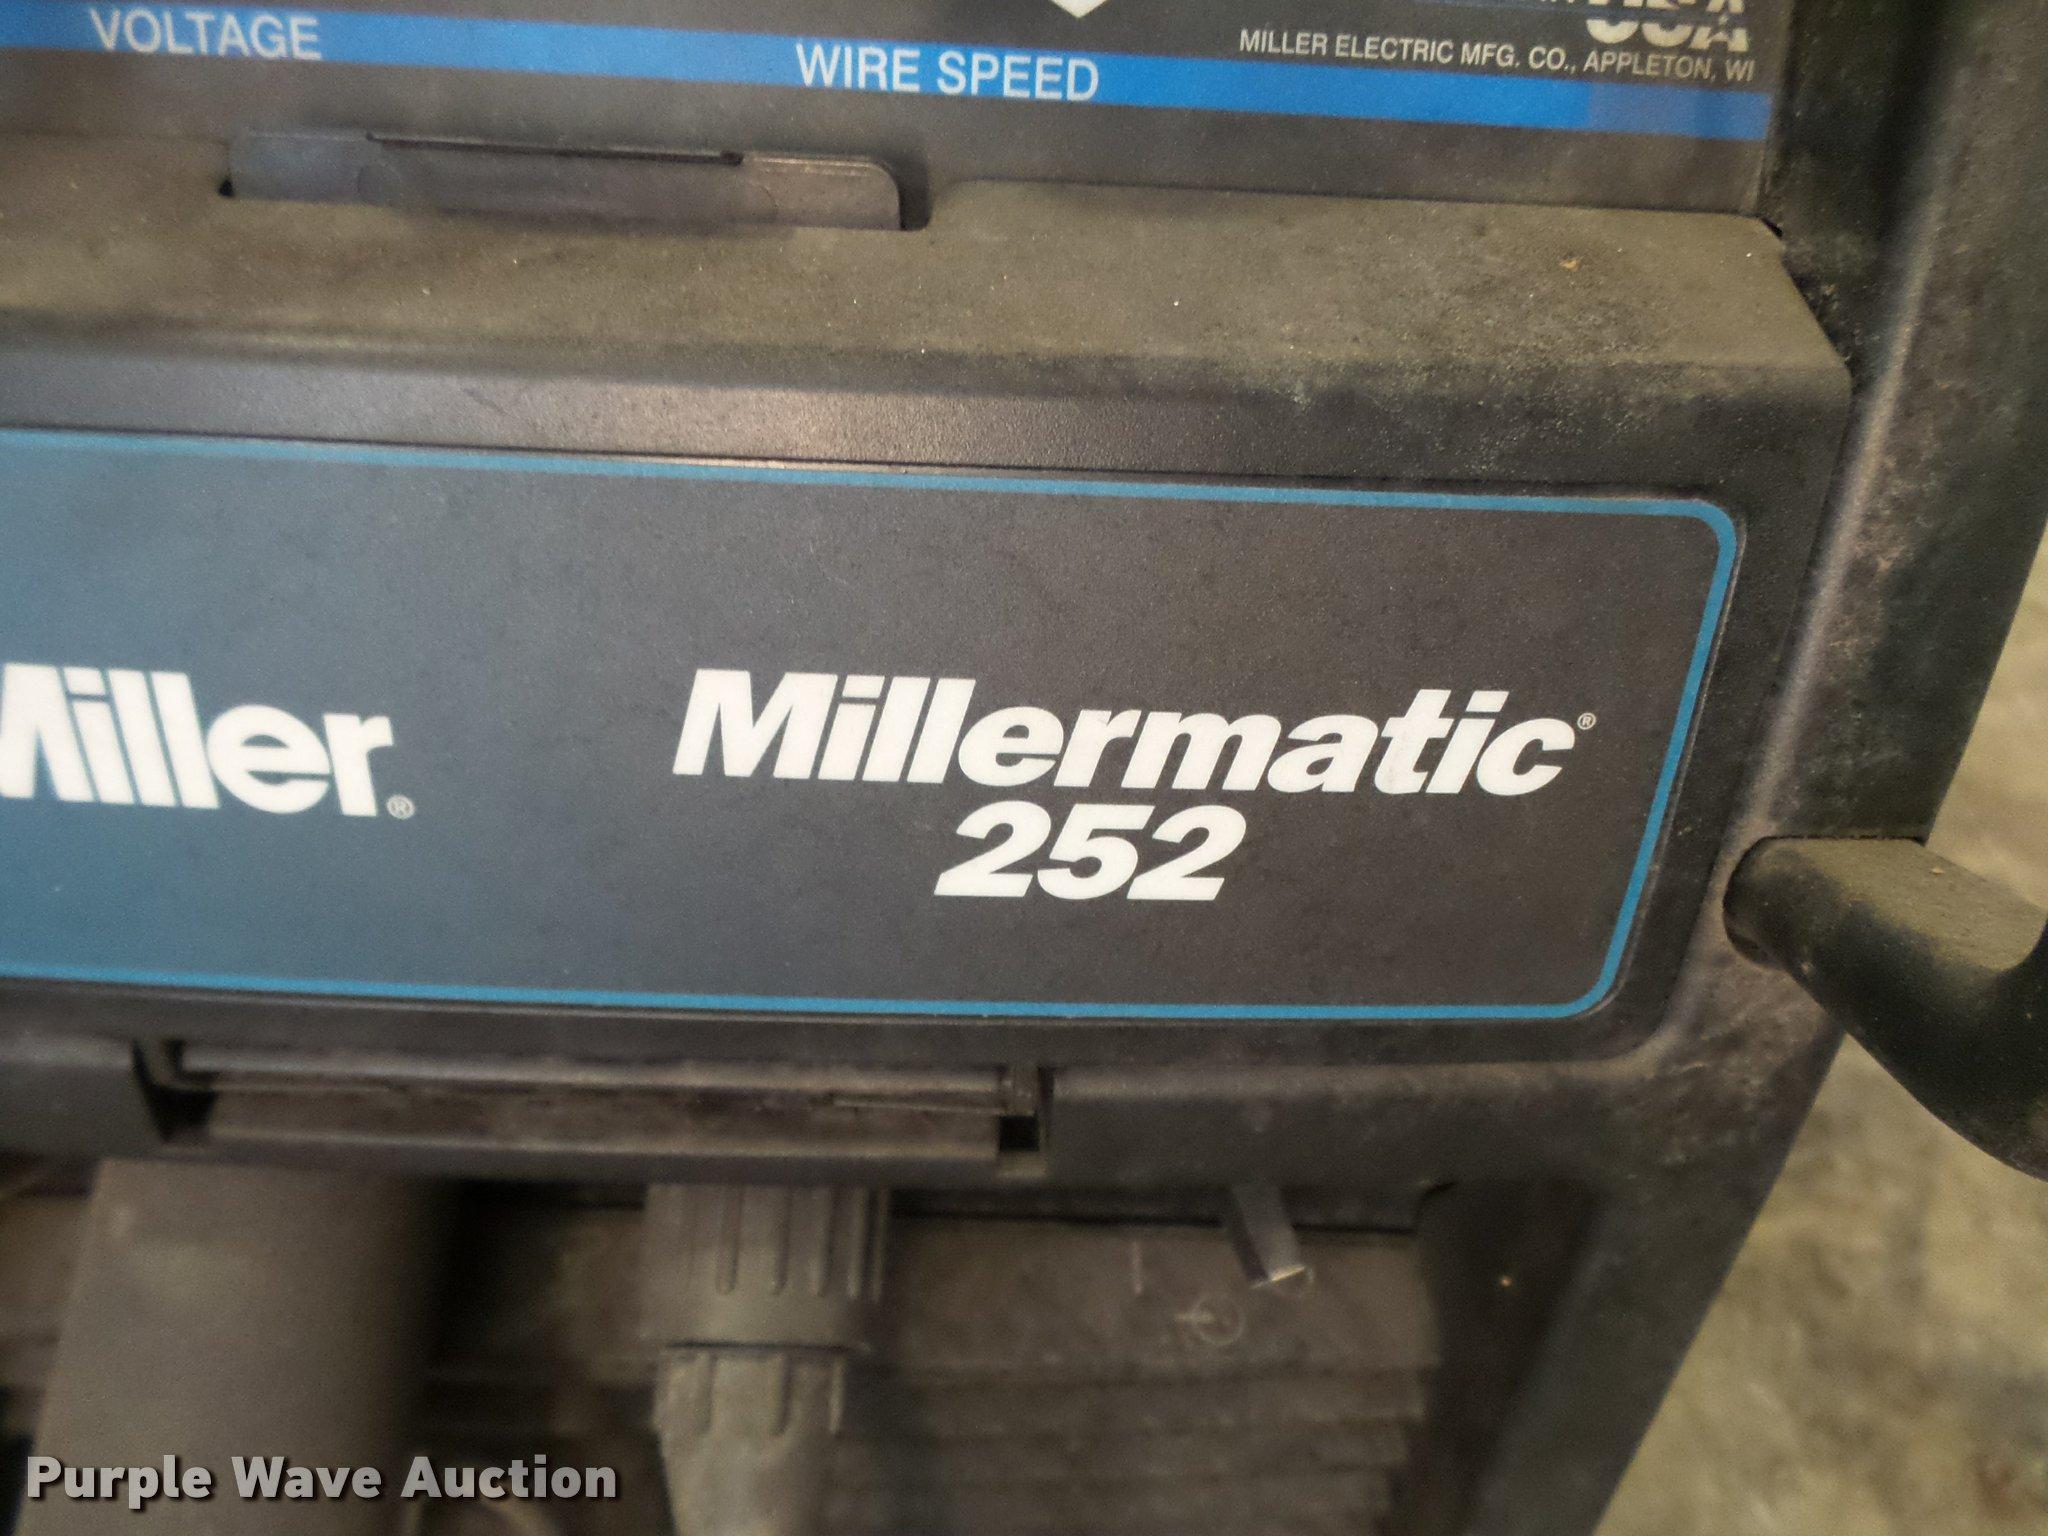 Millermatic 252 mig welder | Item L7197 | SOLD! February 15 ...